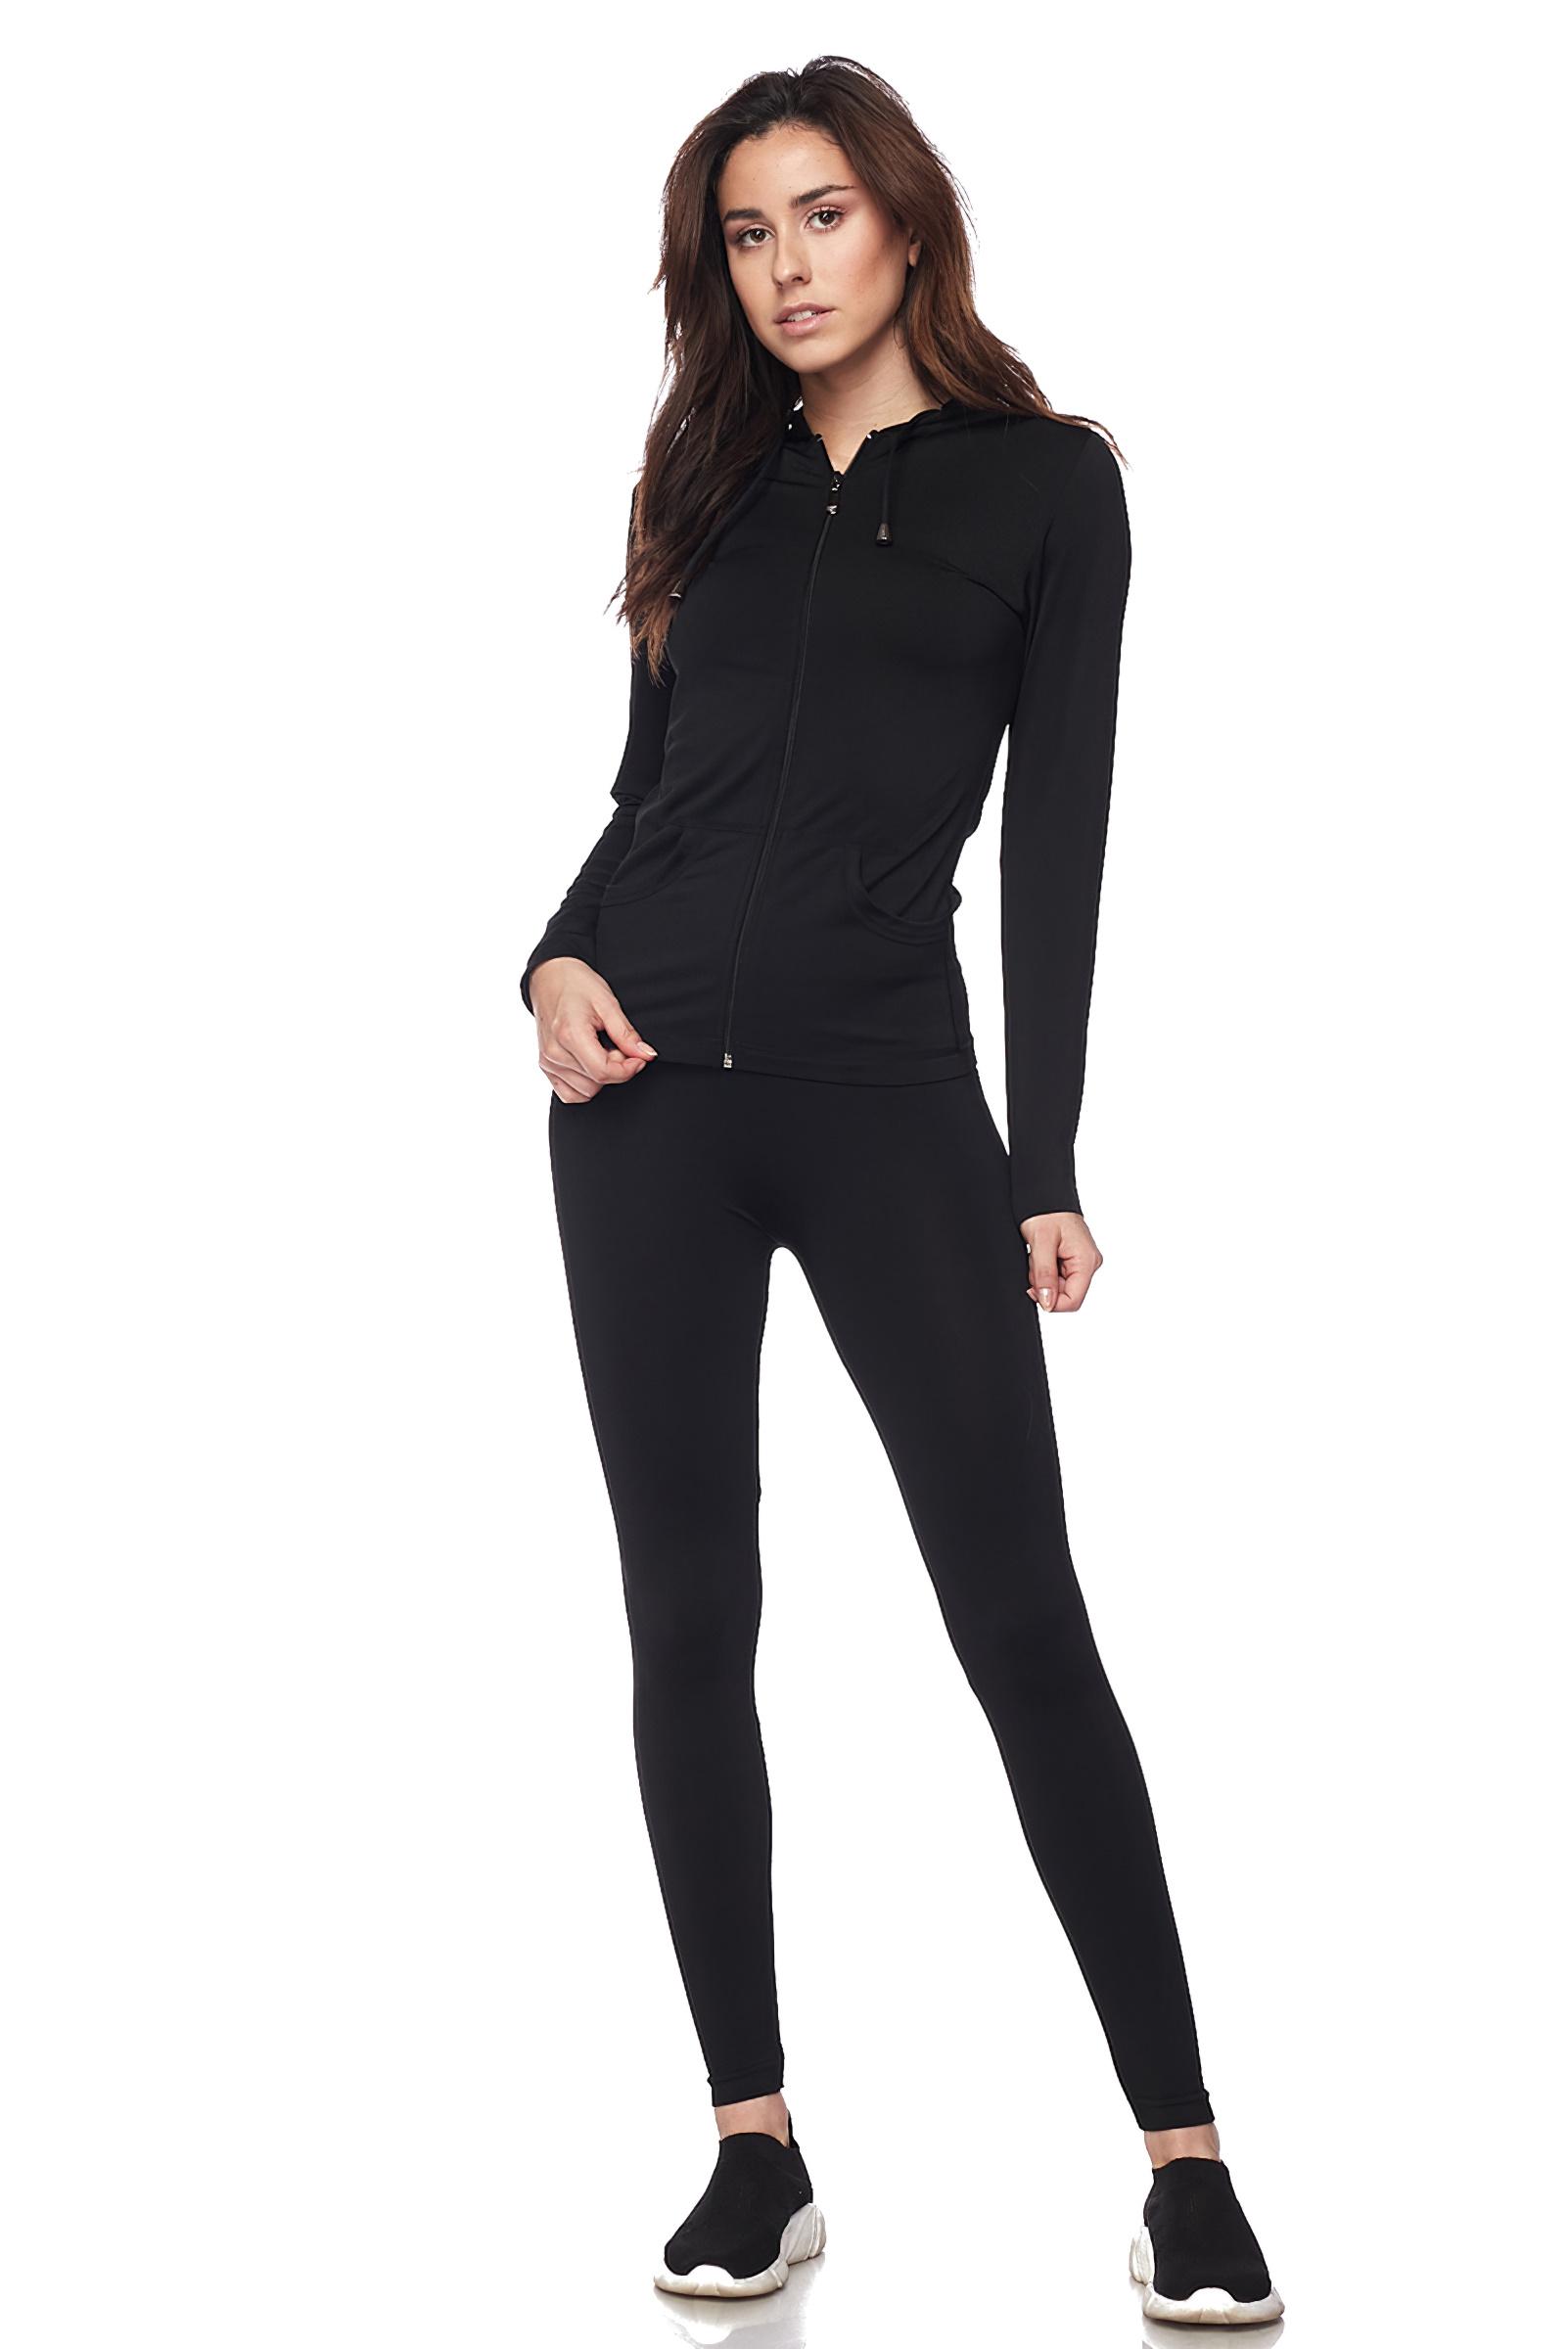 Women-039-s-Juniors-Active-Set-Wear-Zip-Up-Hoodie-and-Legging thumbnail 12